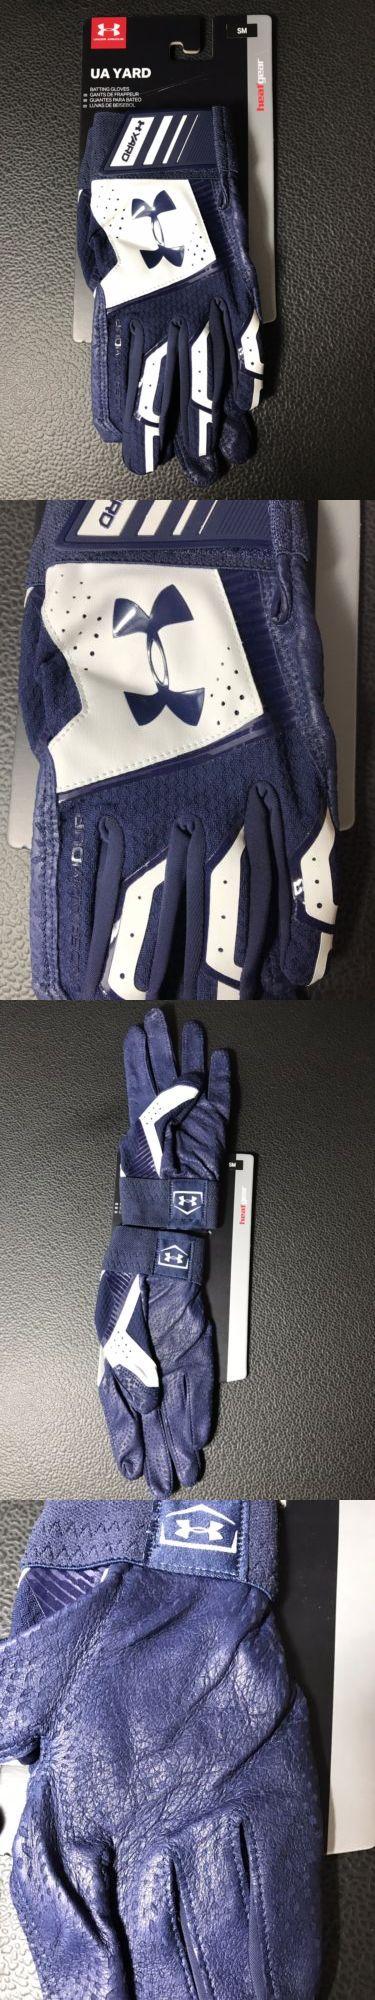 418e8501c81b7 Batting Gloves 181351  Under Armour Men S Ua Yard Baseball Batting Glove  Navy  45 Size Sm -  BUY IT NOW ONLY   24.99 on  eBay  batting  gloves   under ...